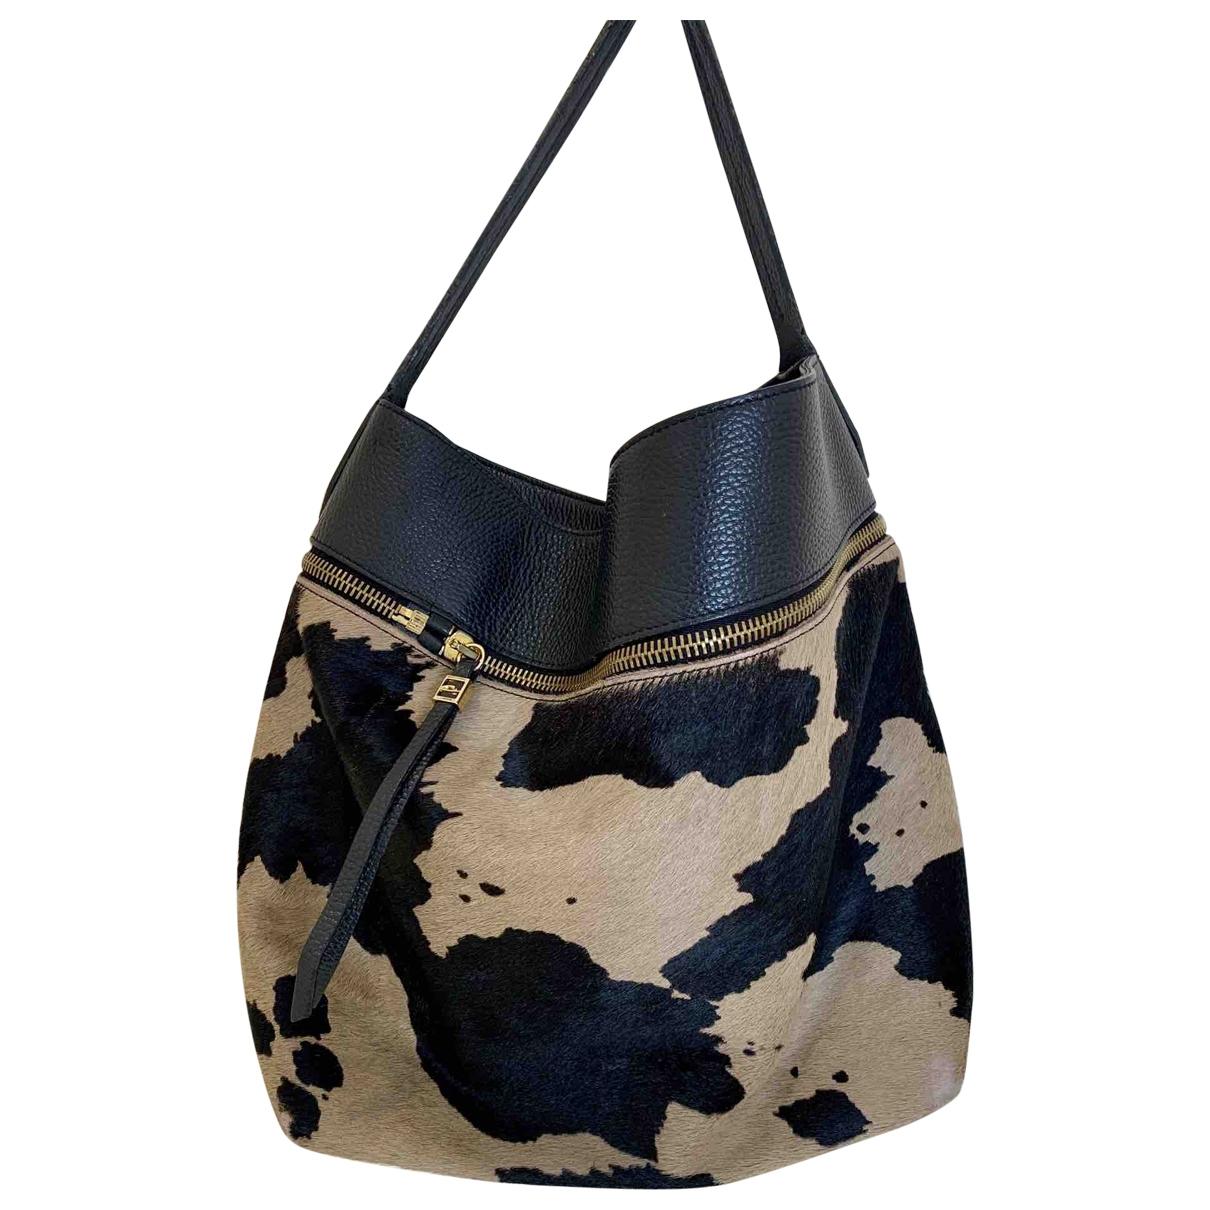 Gianni Chiarini \N Fur handbag for Women \N